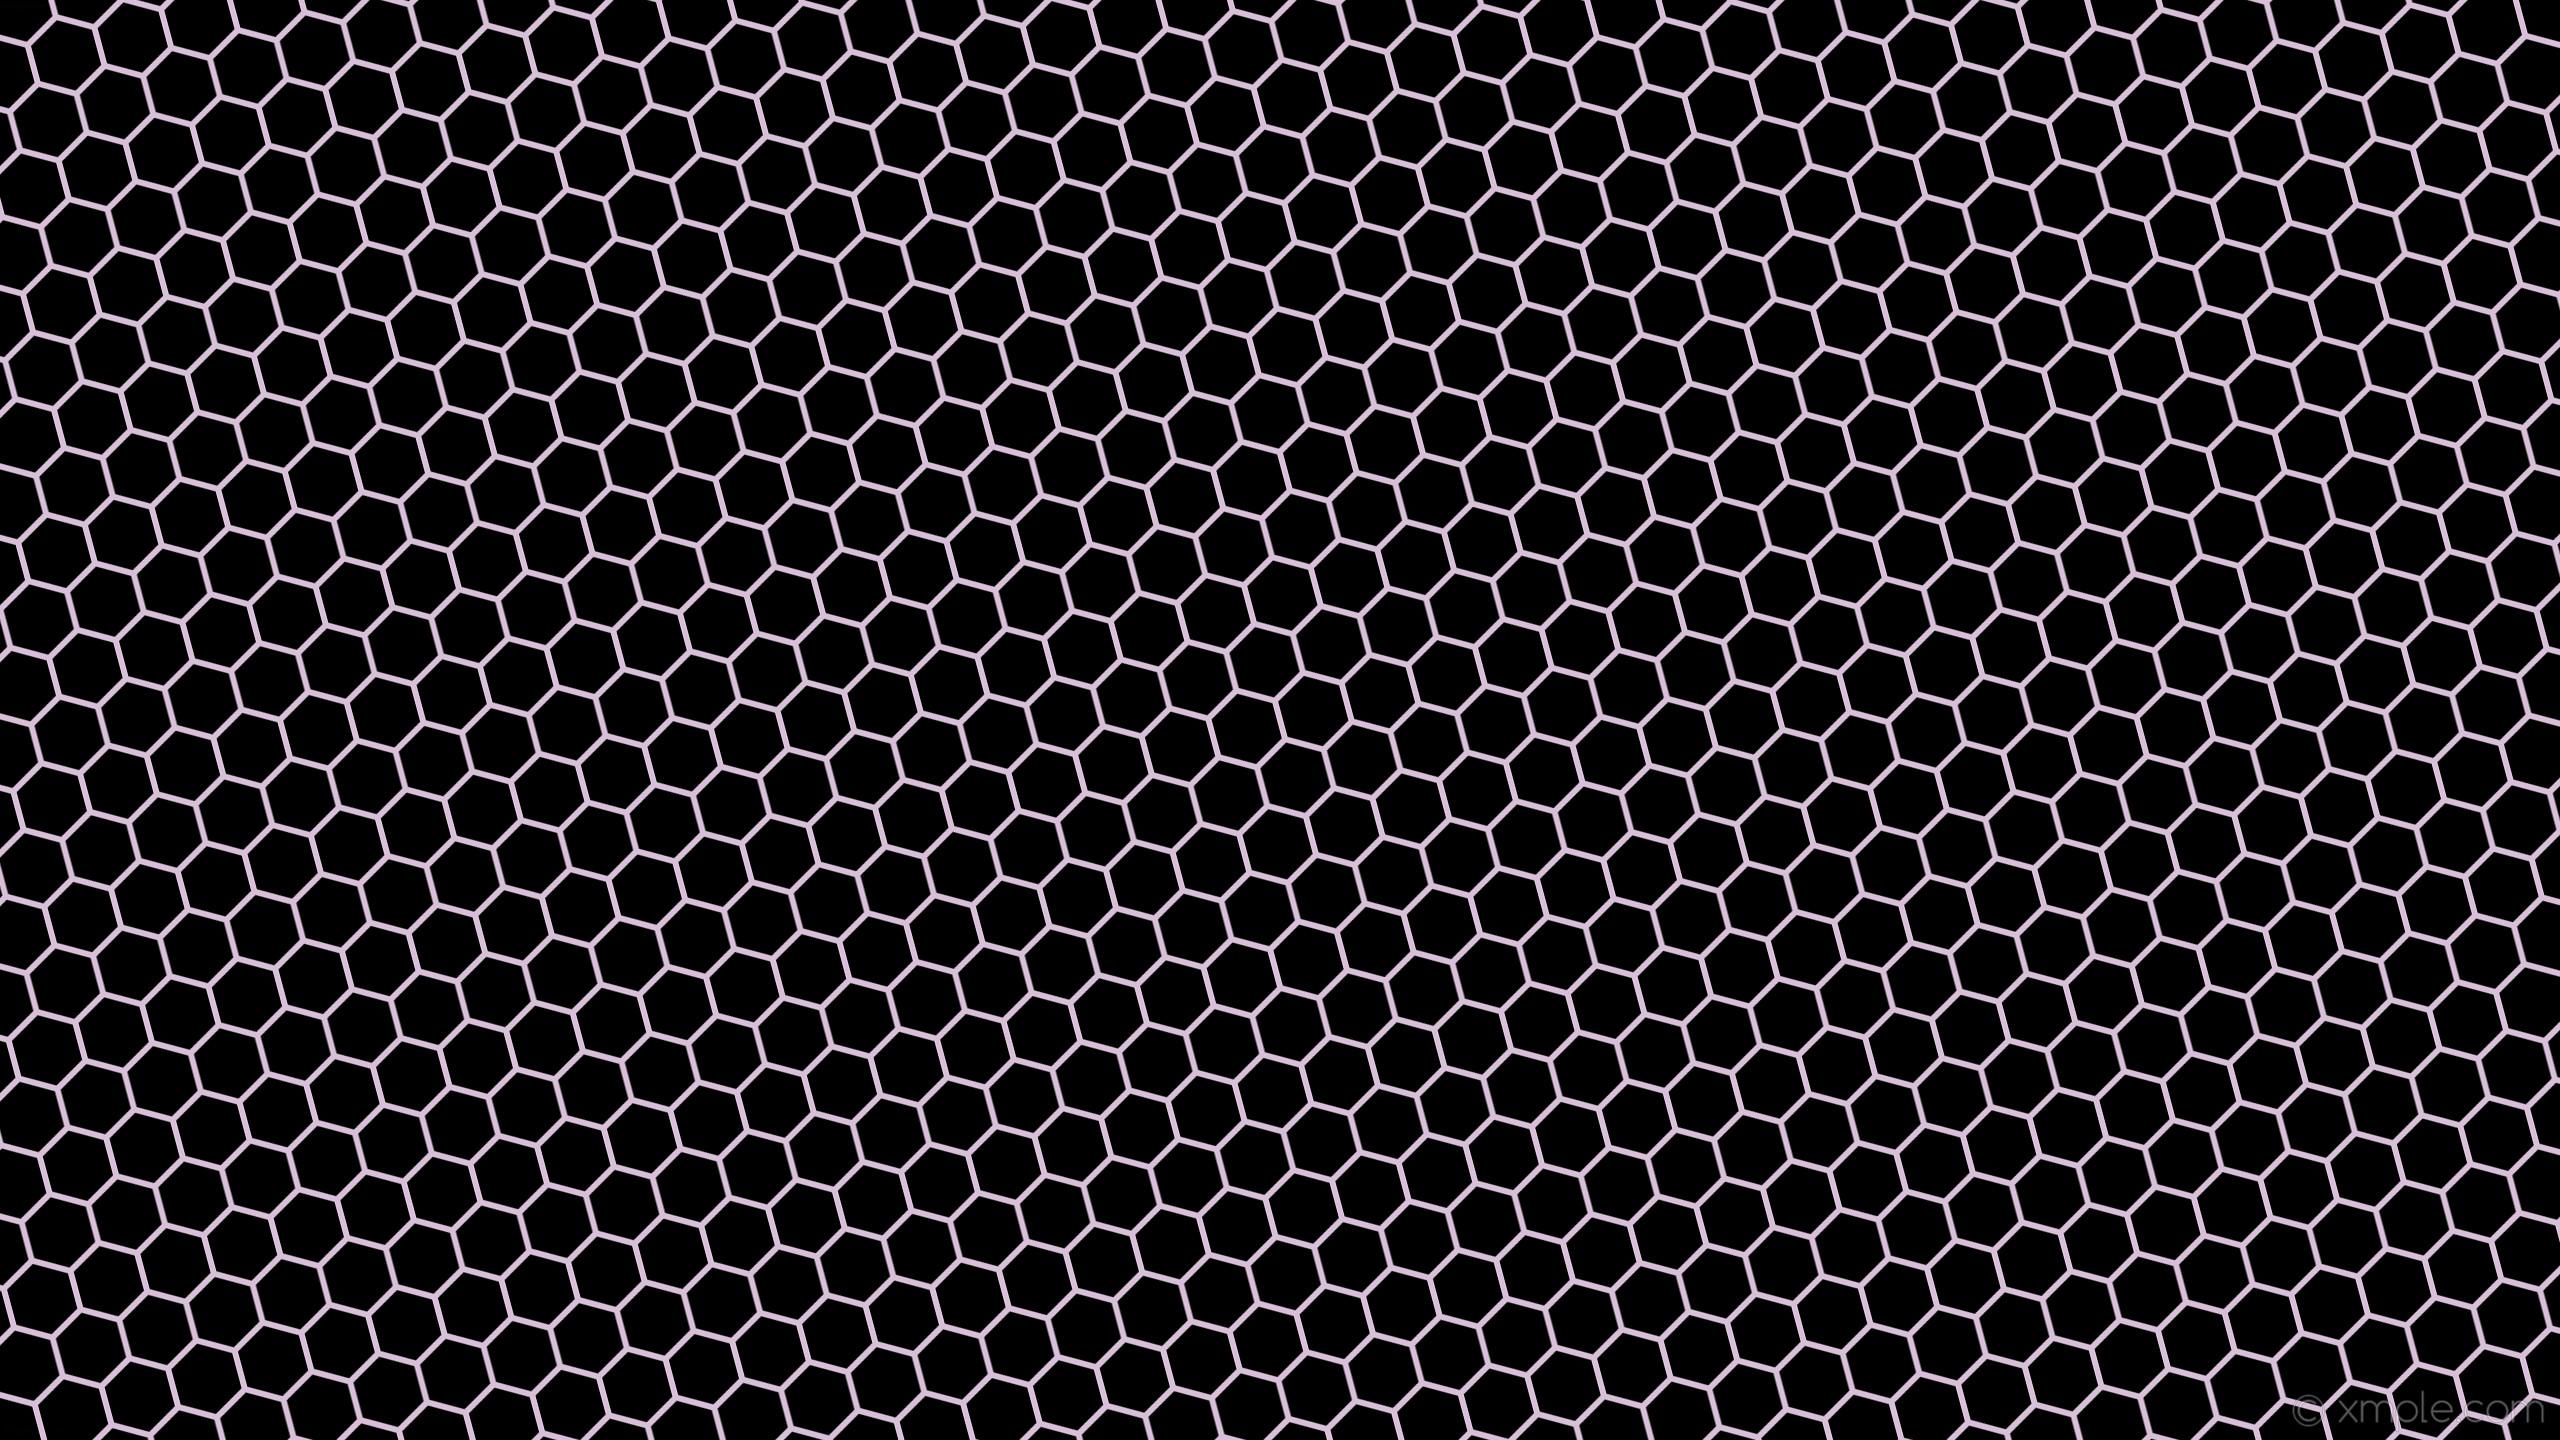 wallpaper beehive honeycomb black hexagon purple thistle #000000 #d8bfd8  diagonal 15° 6px 69px